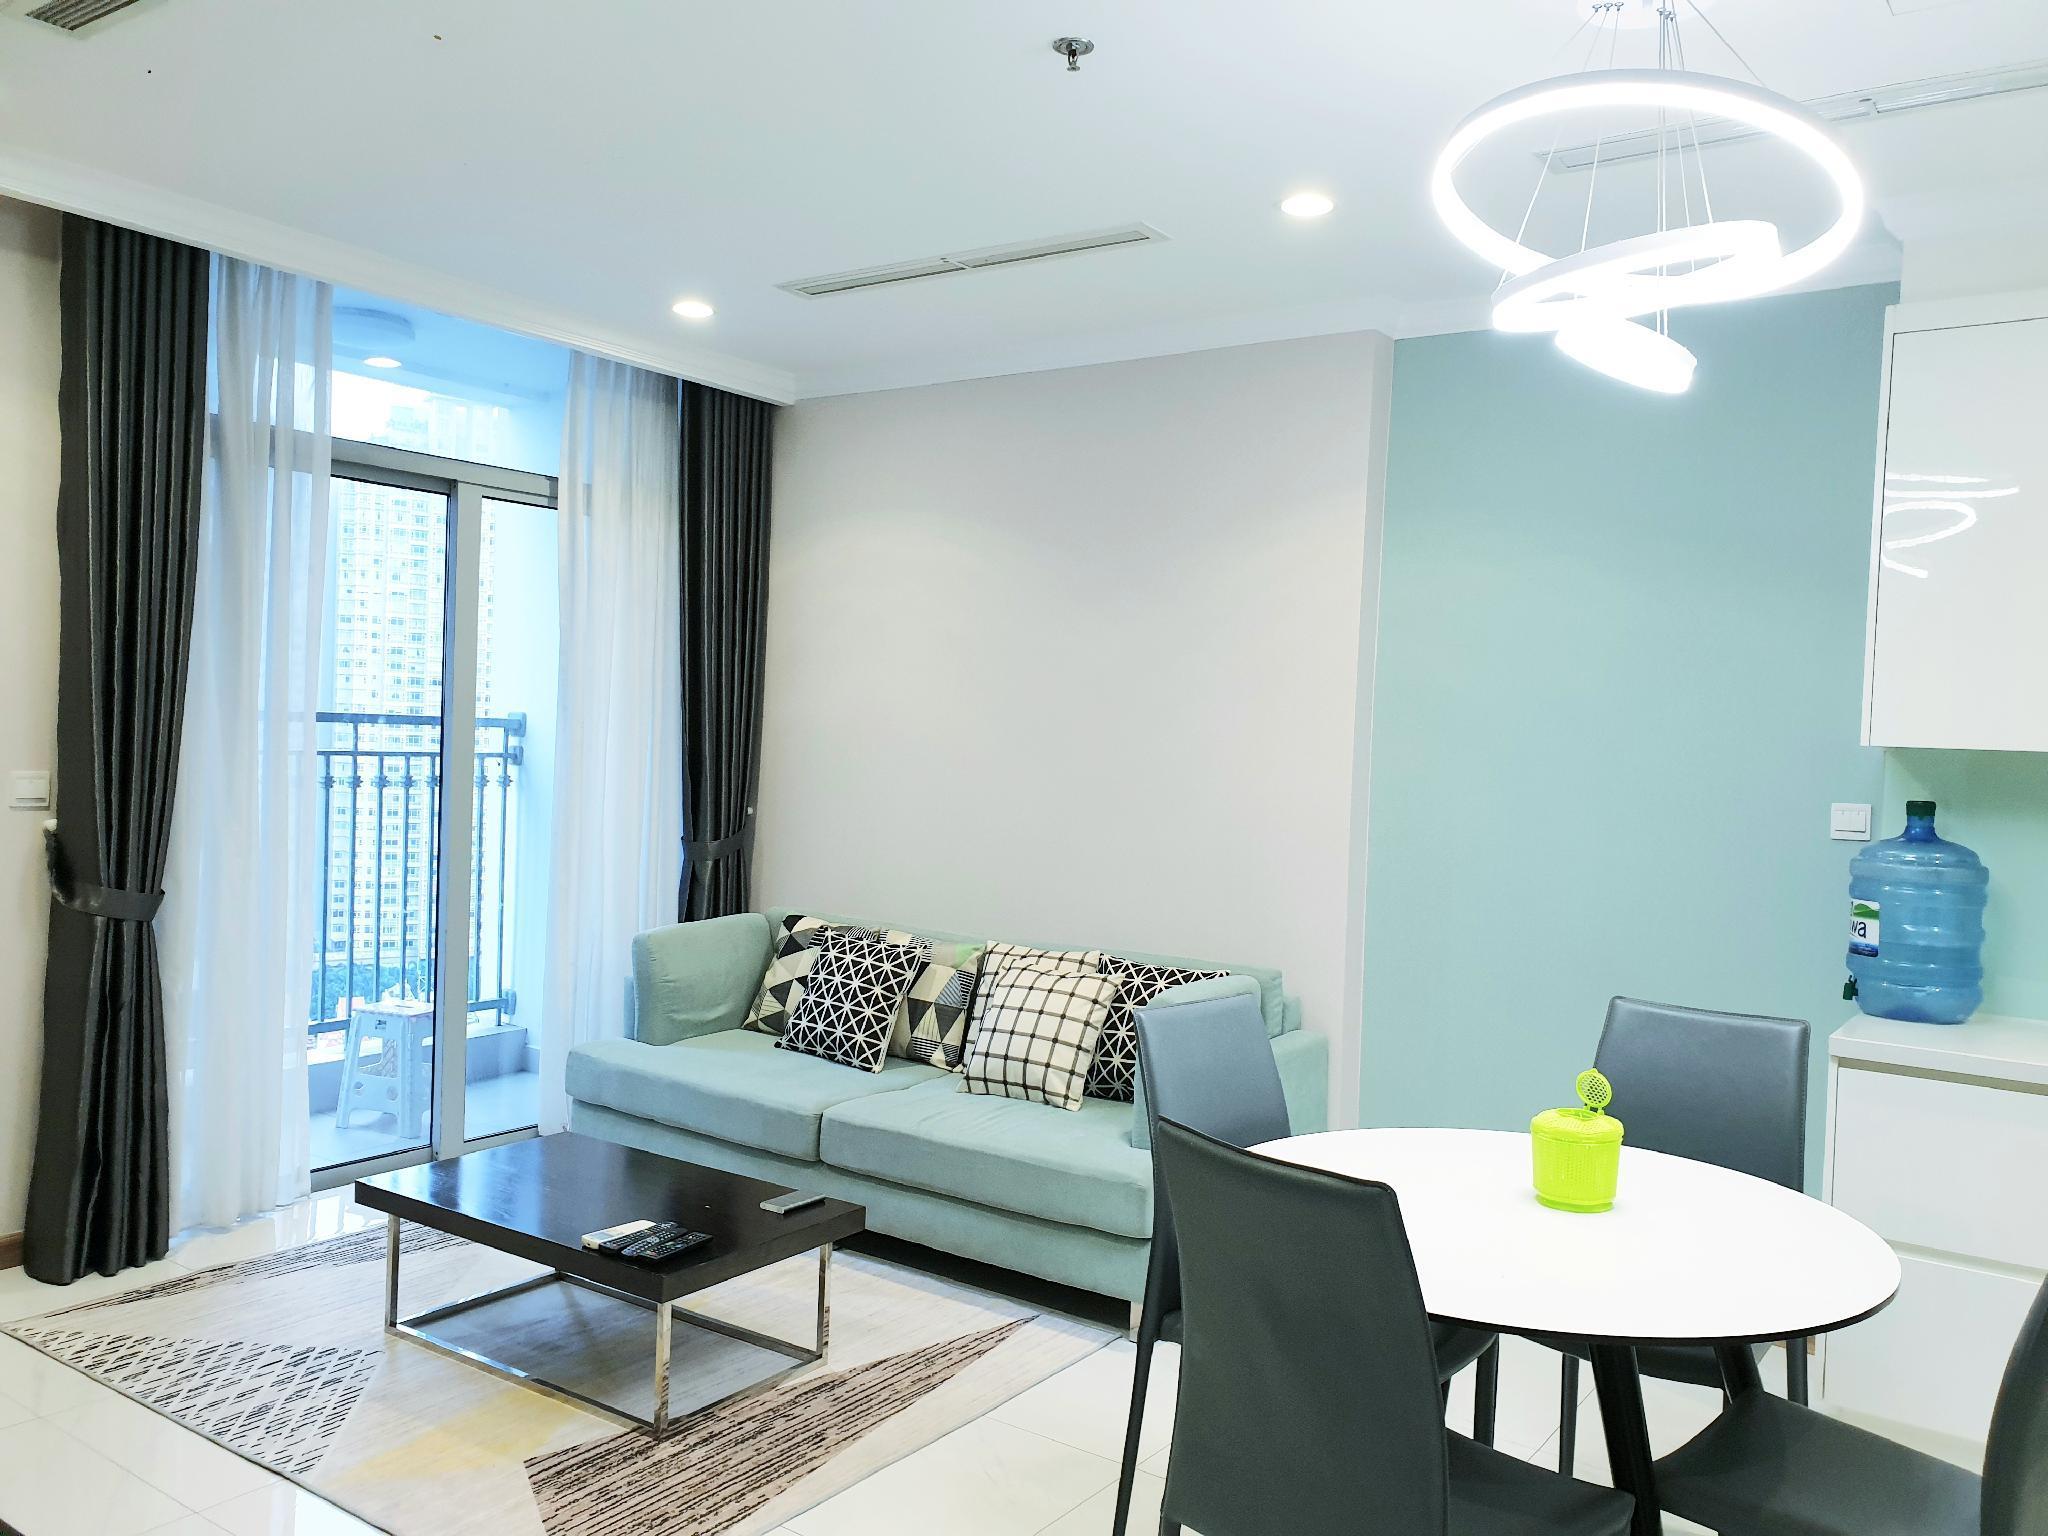 Halen Apartmens 1bedroom In Vinhome Central Park